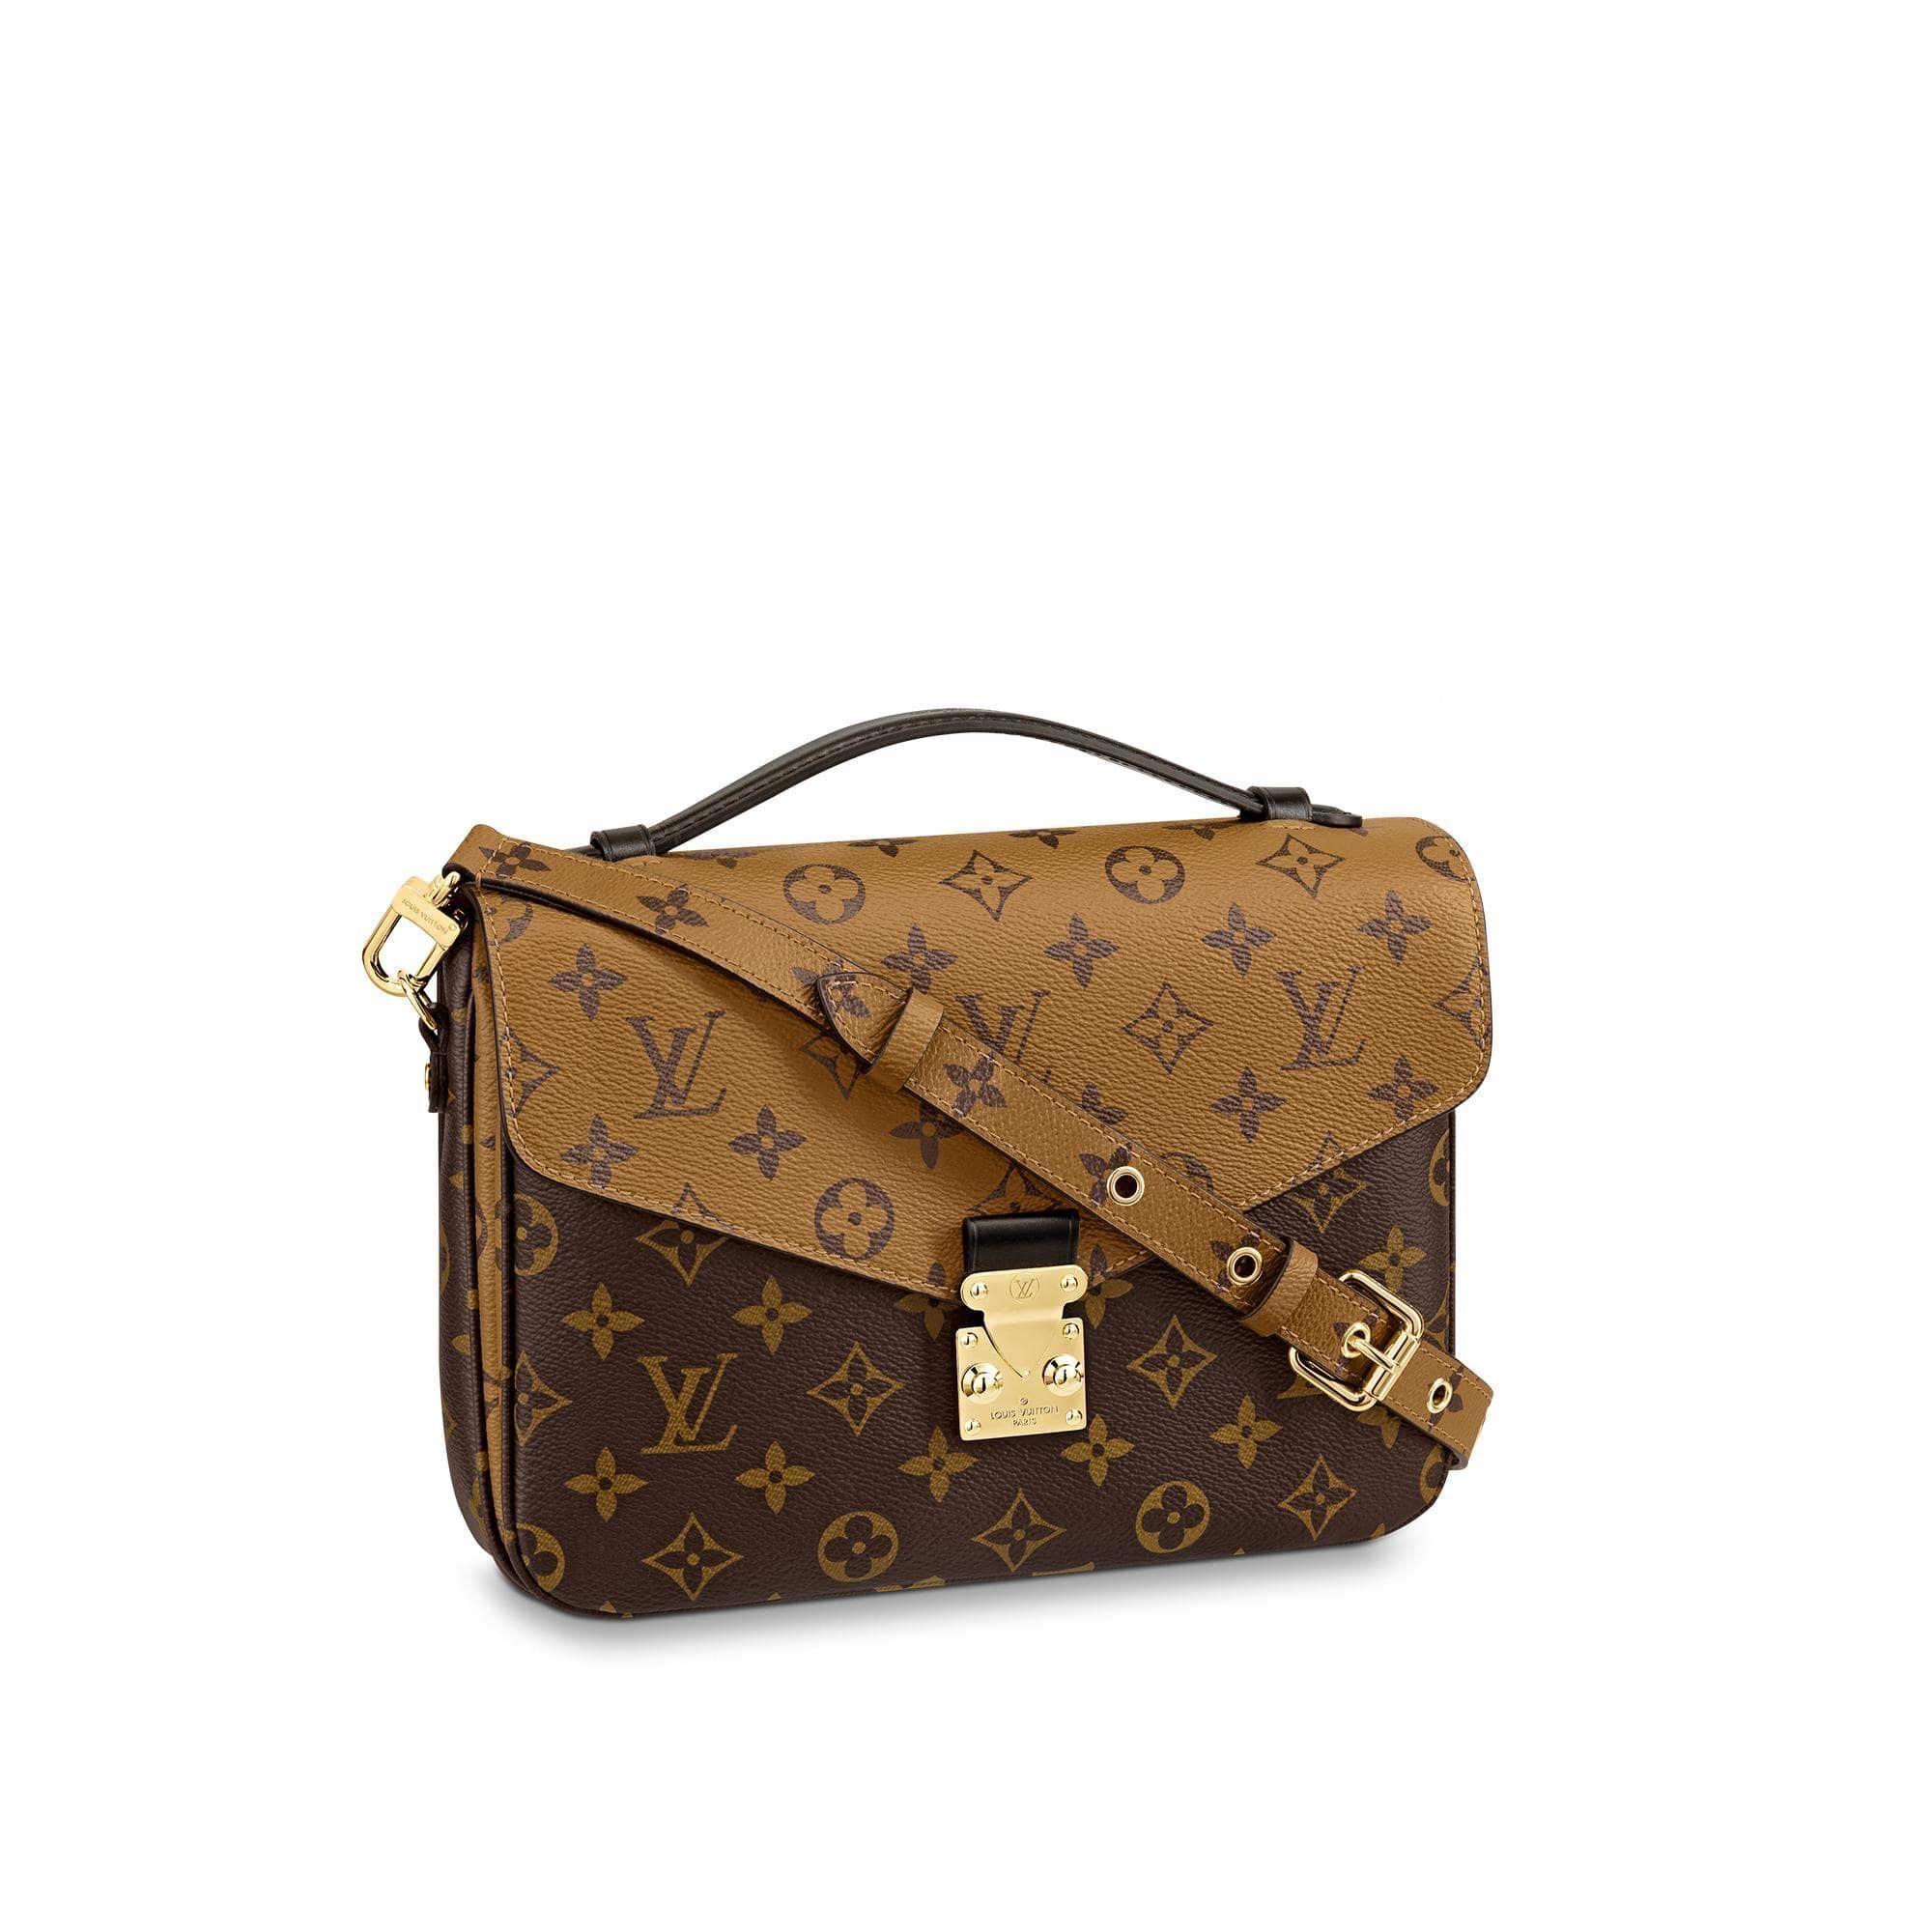 4576412f390 louis vuitton handbags nordstrom  Louisvuittonhandbags Louis Vuitton  Monogram